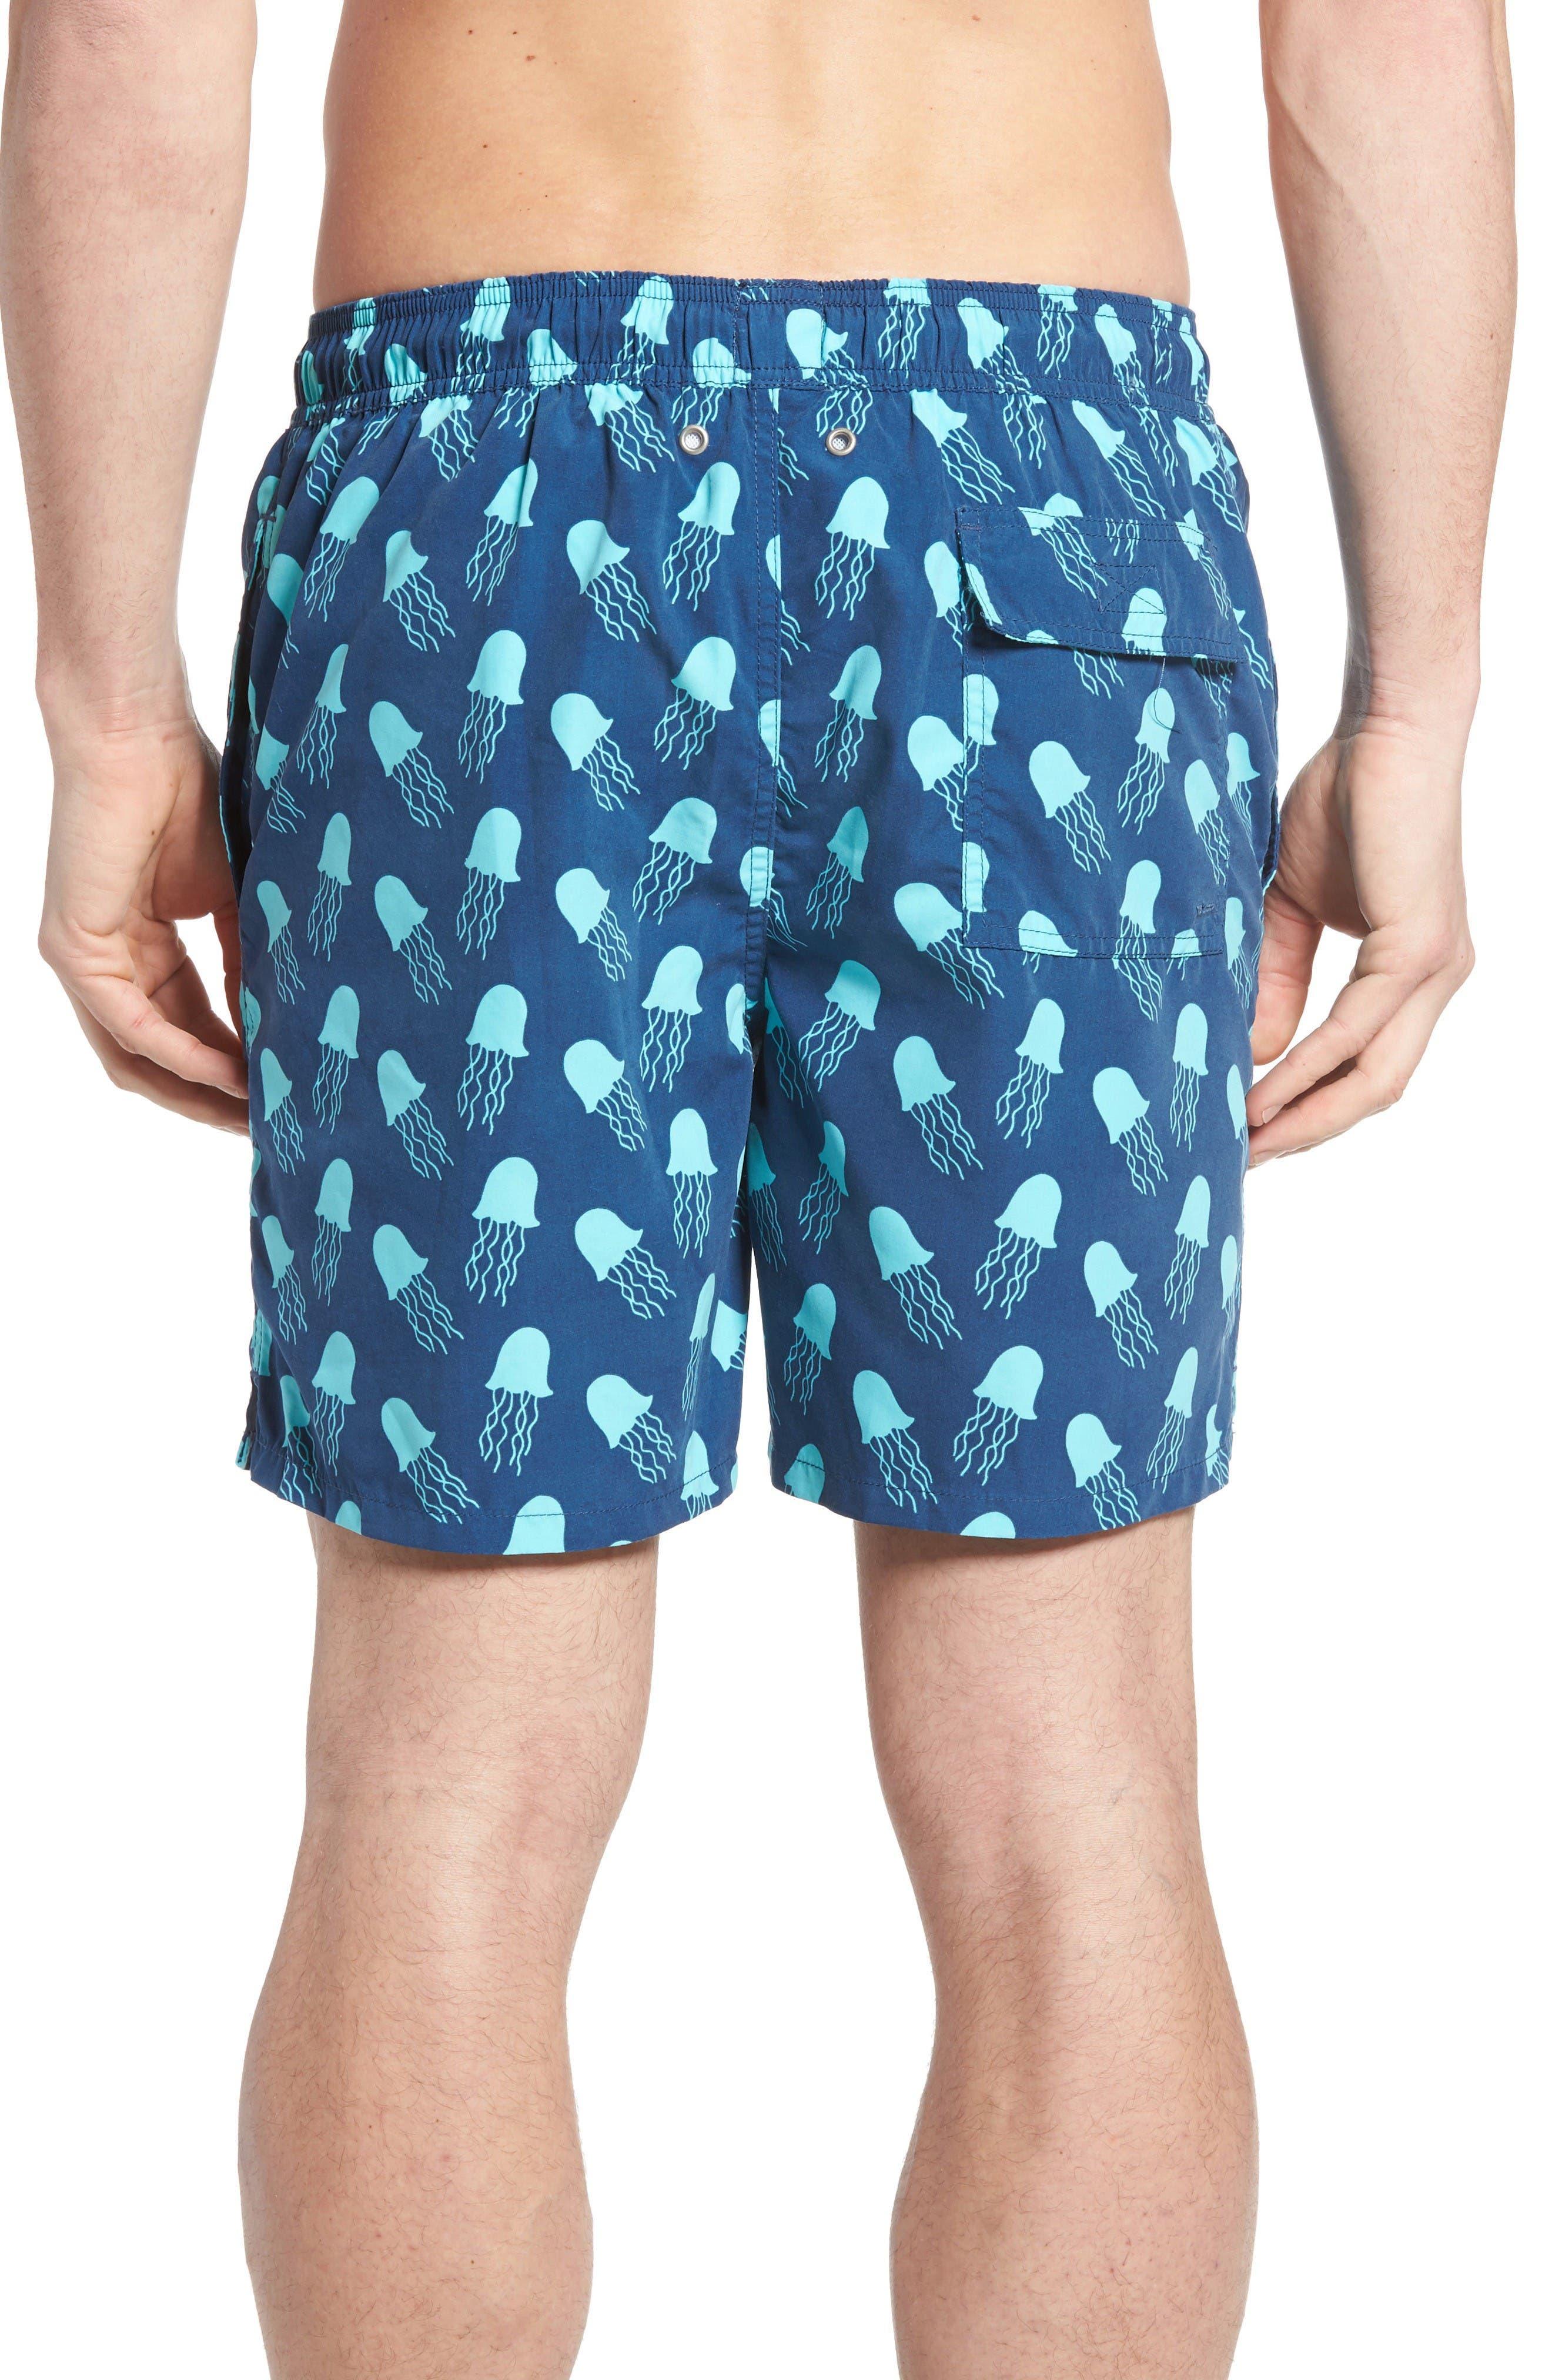 Jellyfish Print Swim Trunks,                             Alternate thumbnail 2, color,                             Navy Turquoise